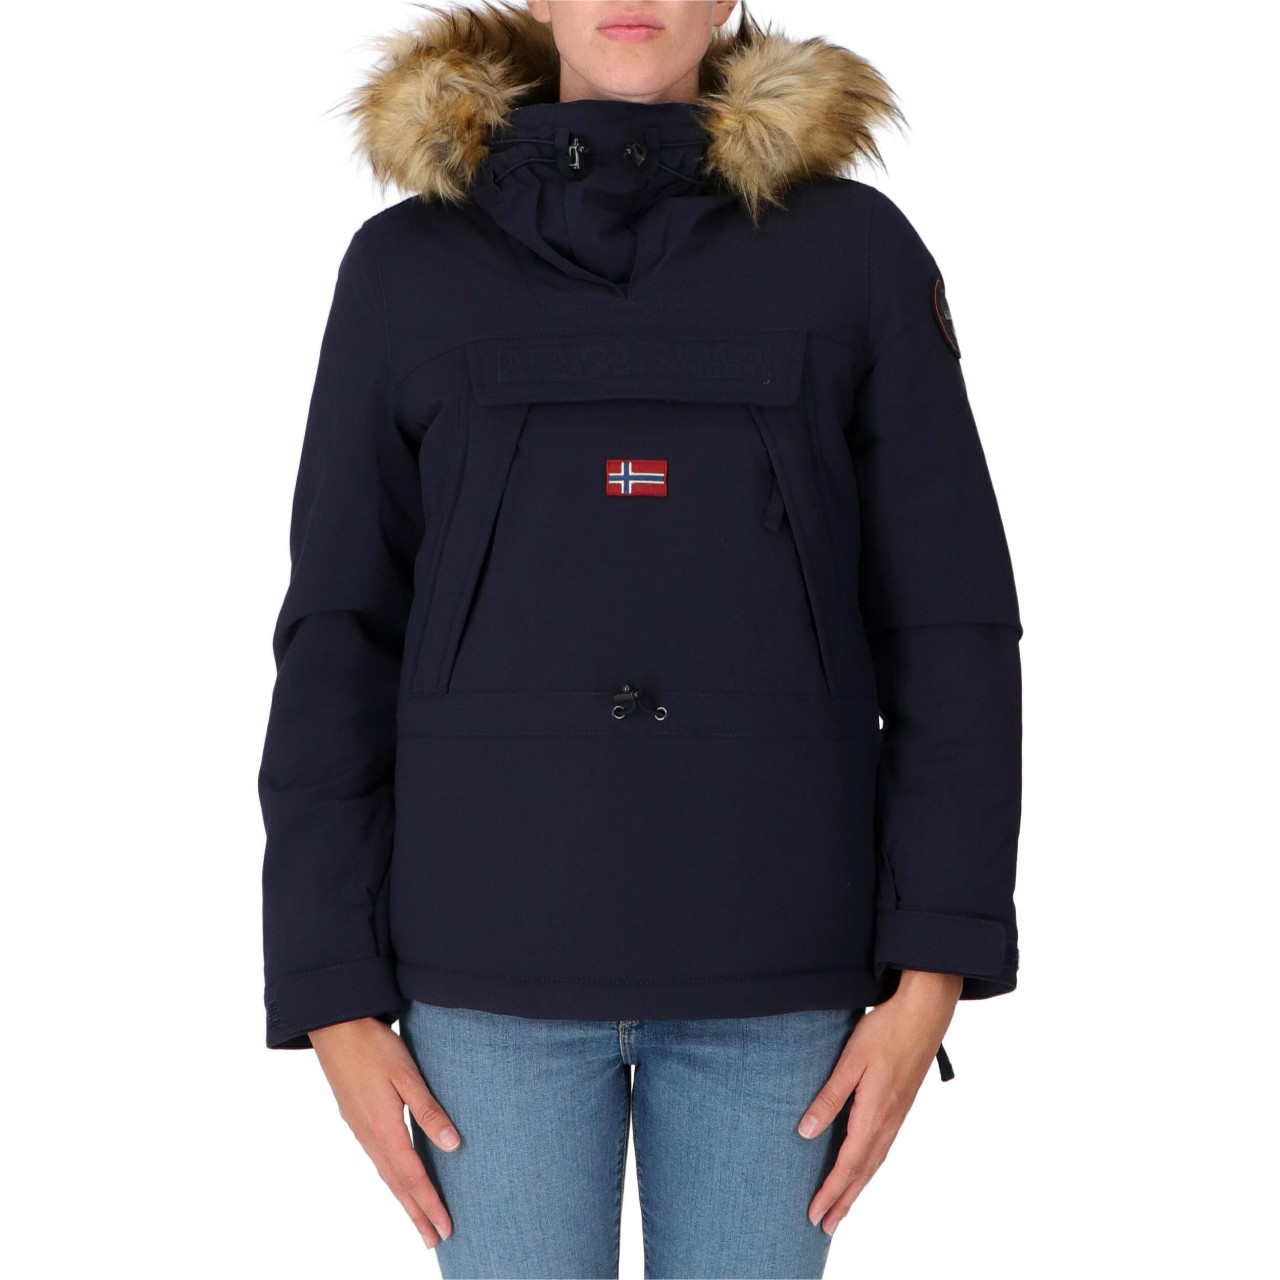 Napapijri Donna Skidoo Napapijri Donna Cordura Fake Fur Icon Cappucci SKIDOOWM